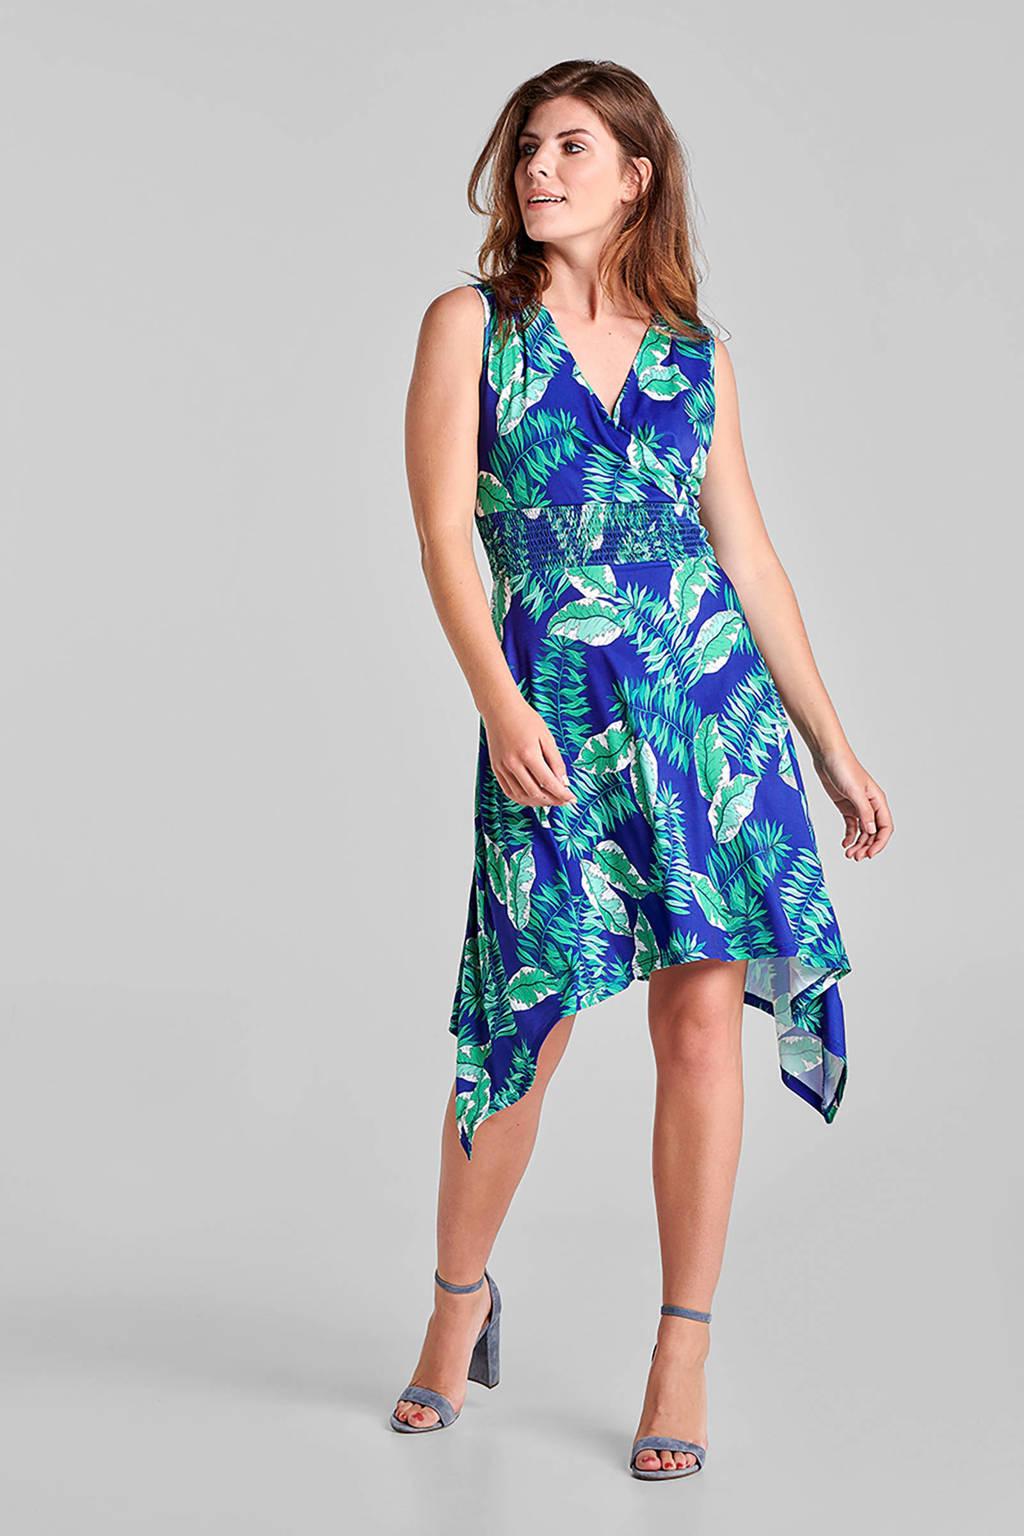 Miss Etam Regulier jurk met bladprint blauw/groen, Blauw/groen